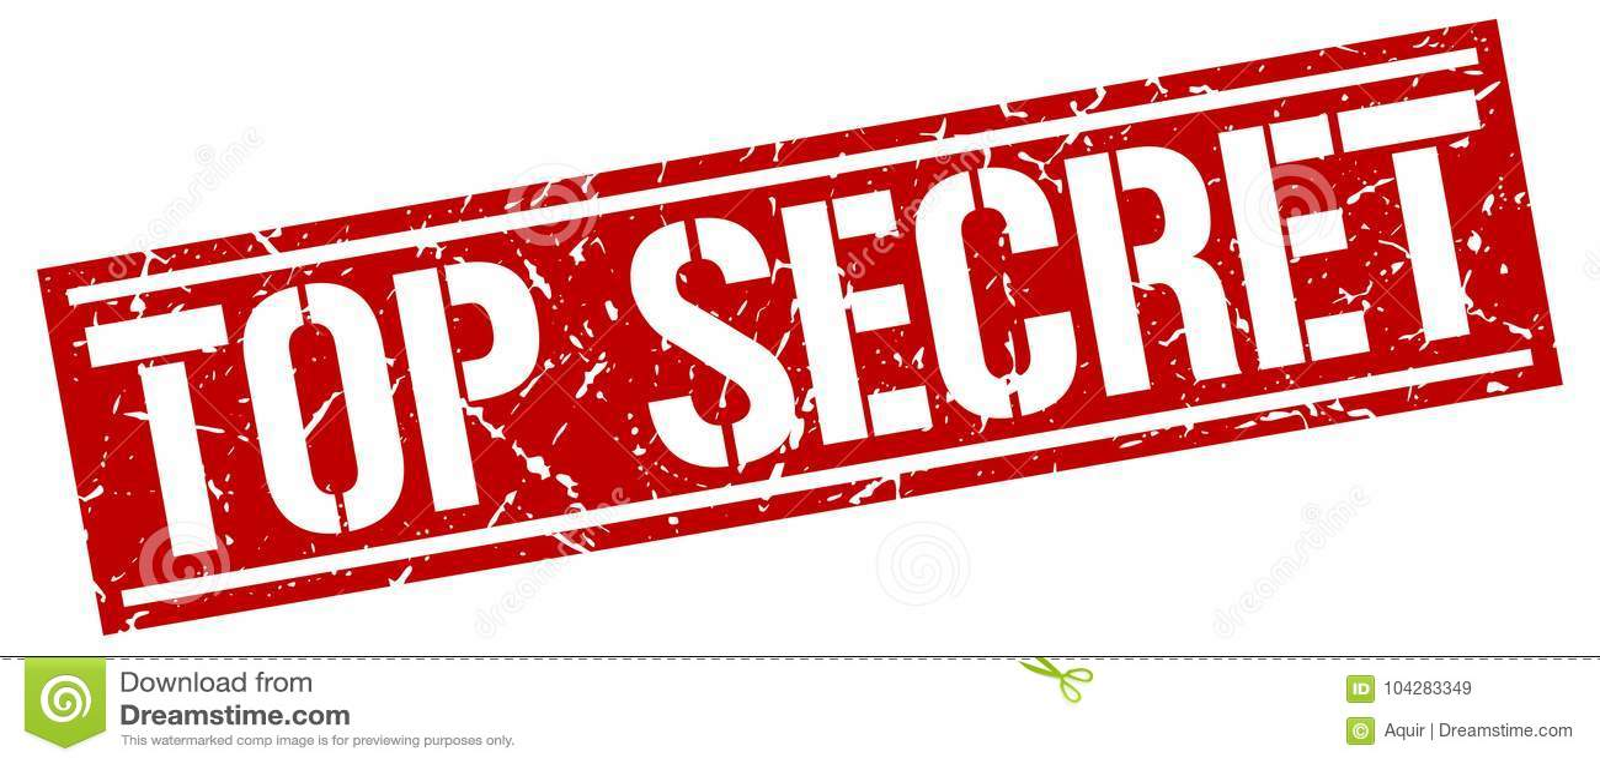 Top Secret Grunge Stamp On White Background